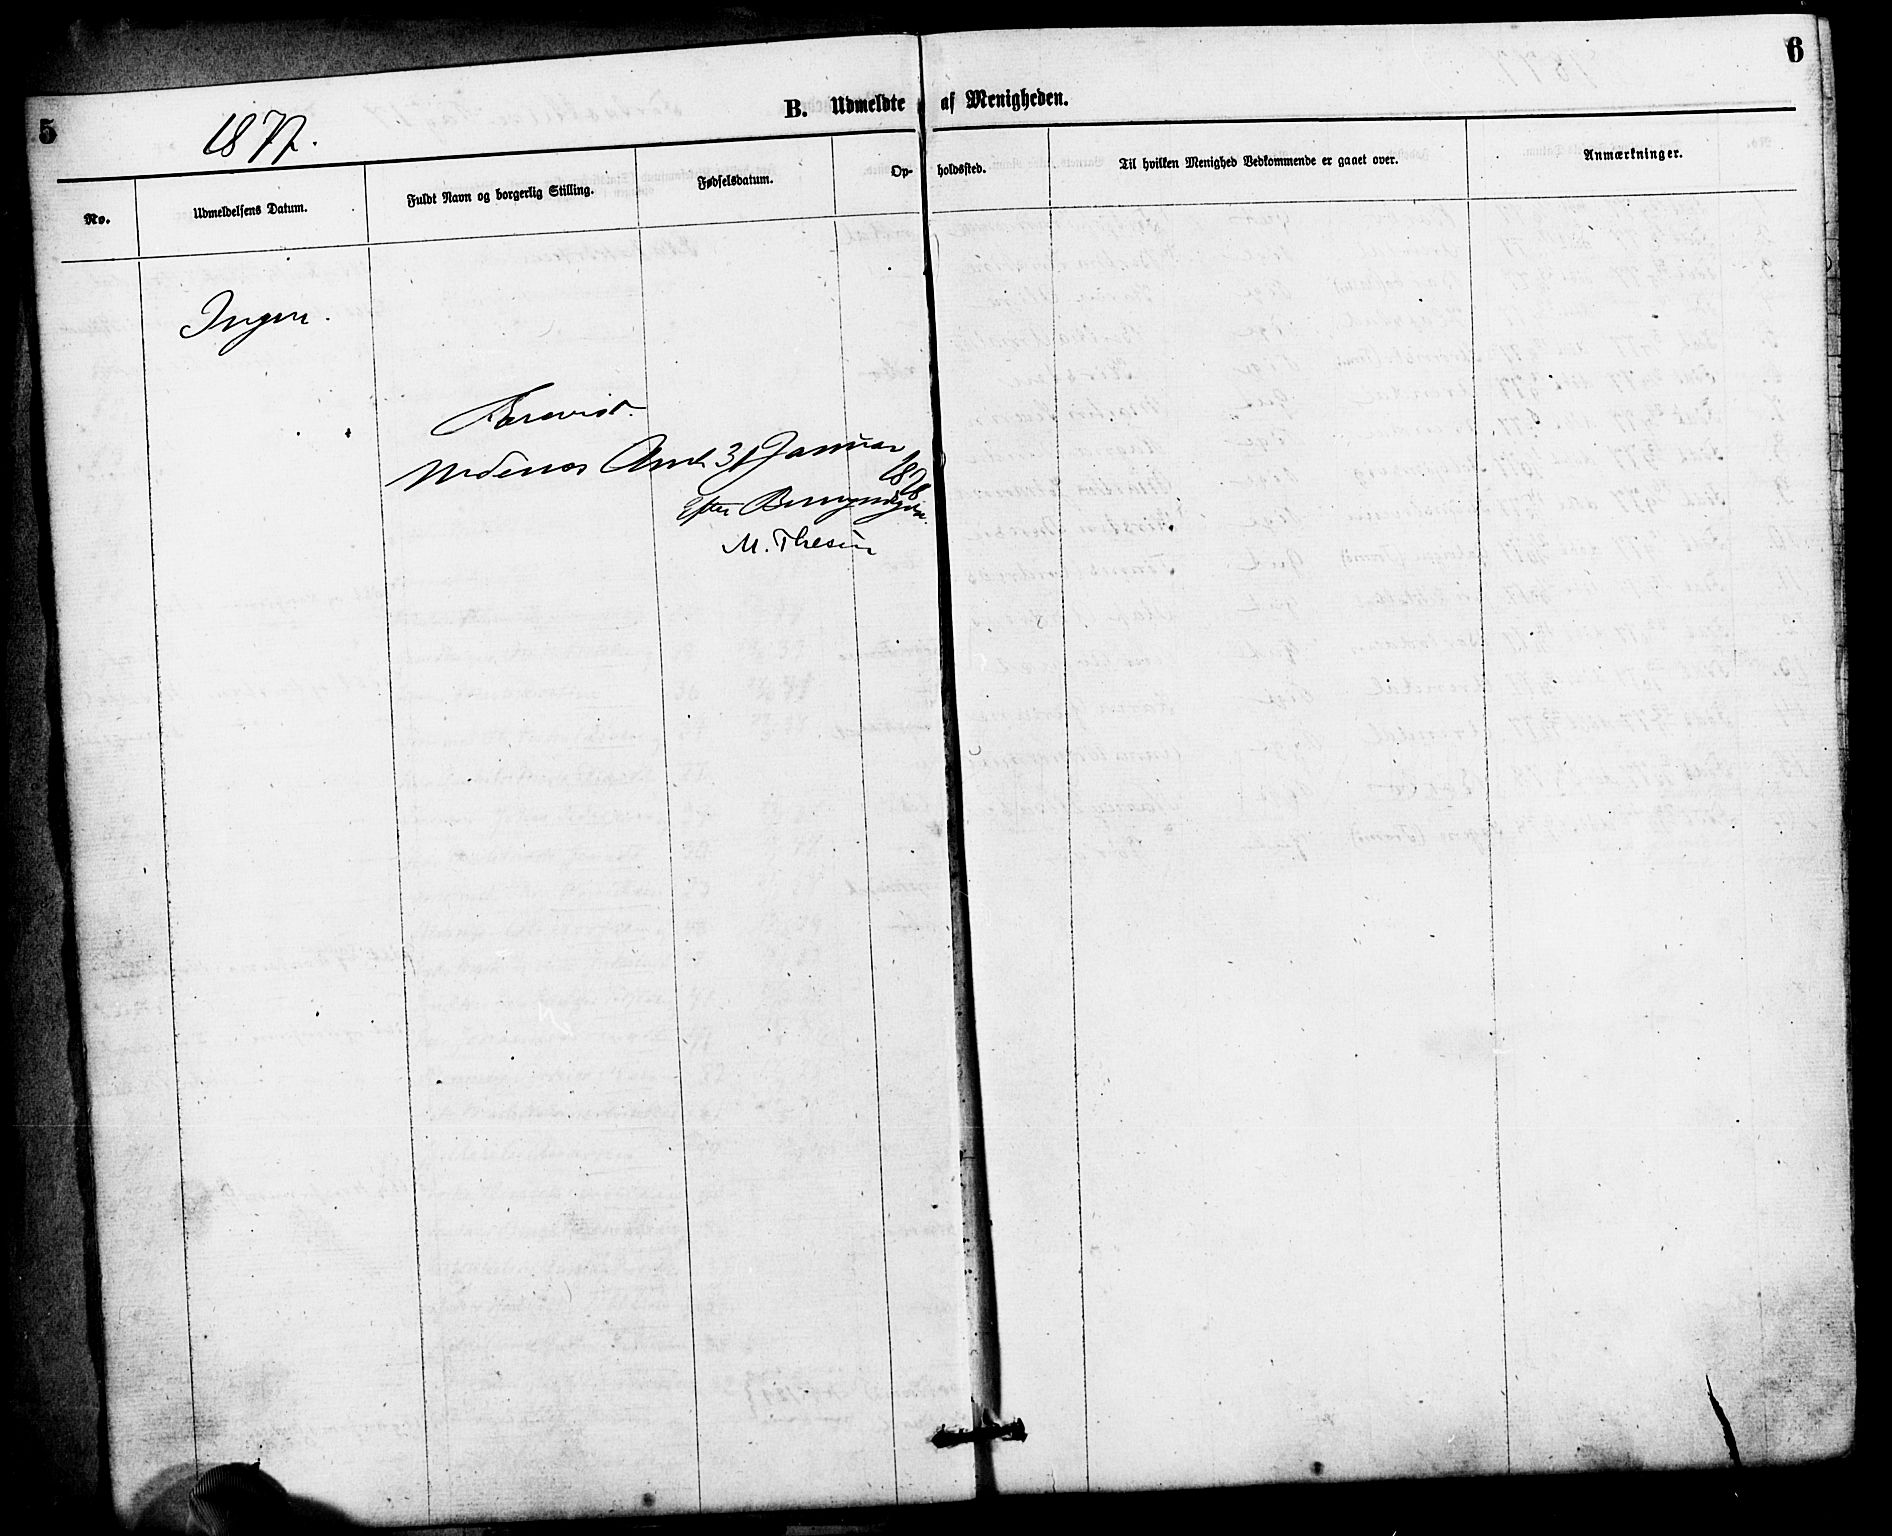 SAK, Den evangelisk-lutherske frimenighet, Arendal, F/Fa/L0001: Dissenterprotokoll nr. F 5, 1877-1883, s. 5-6